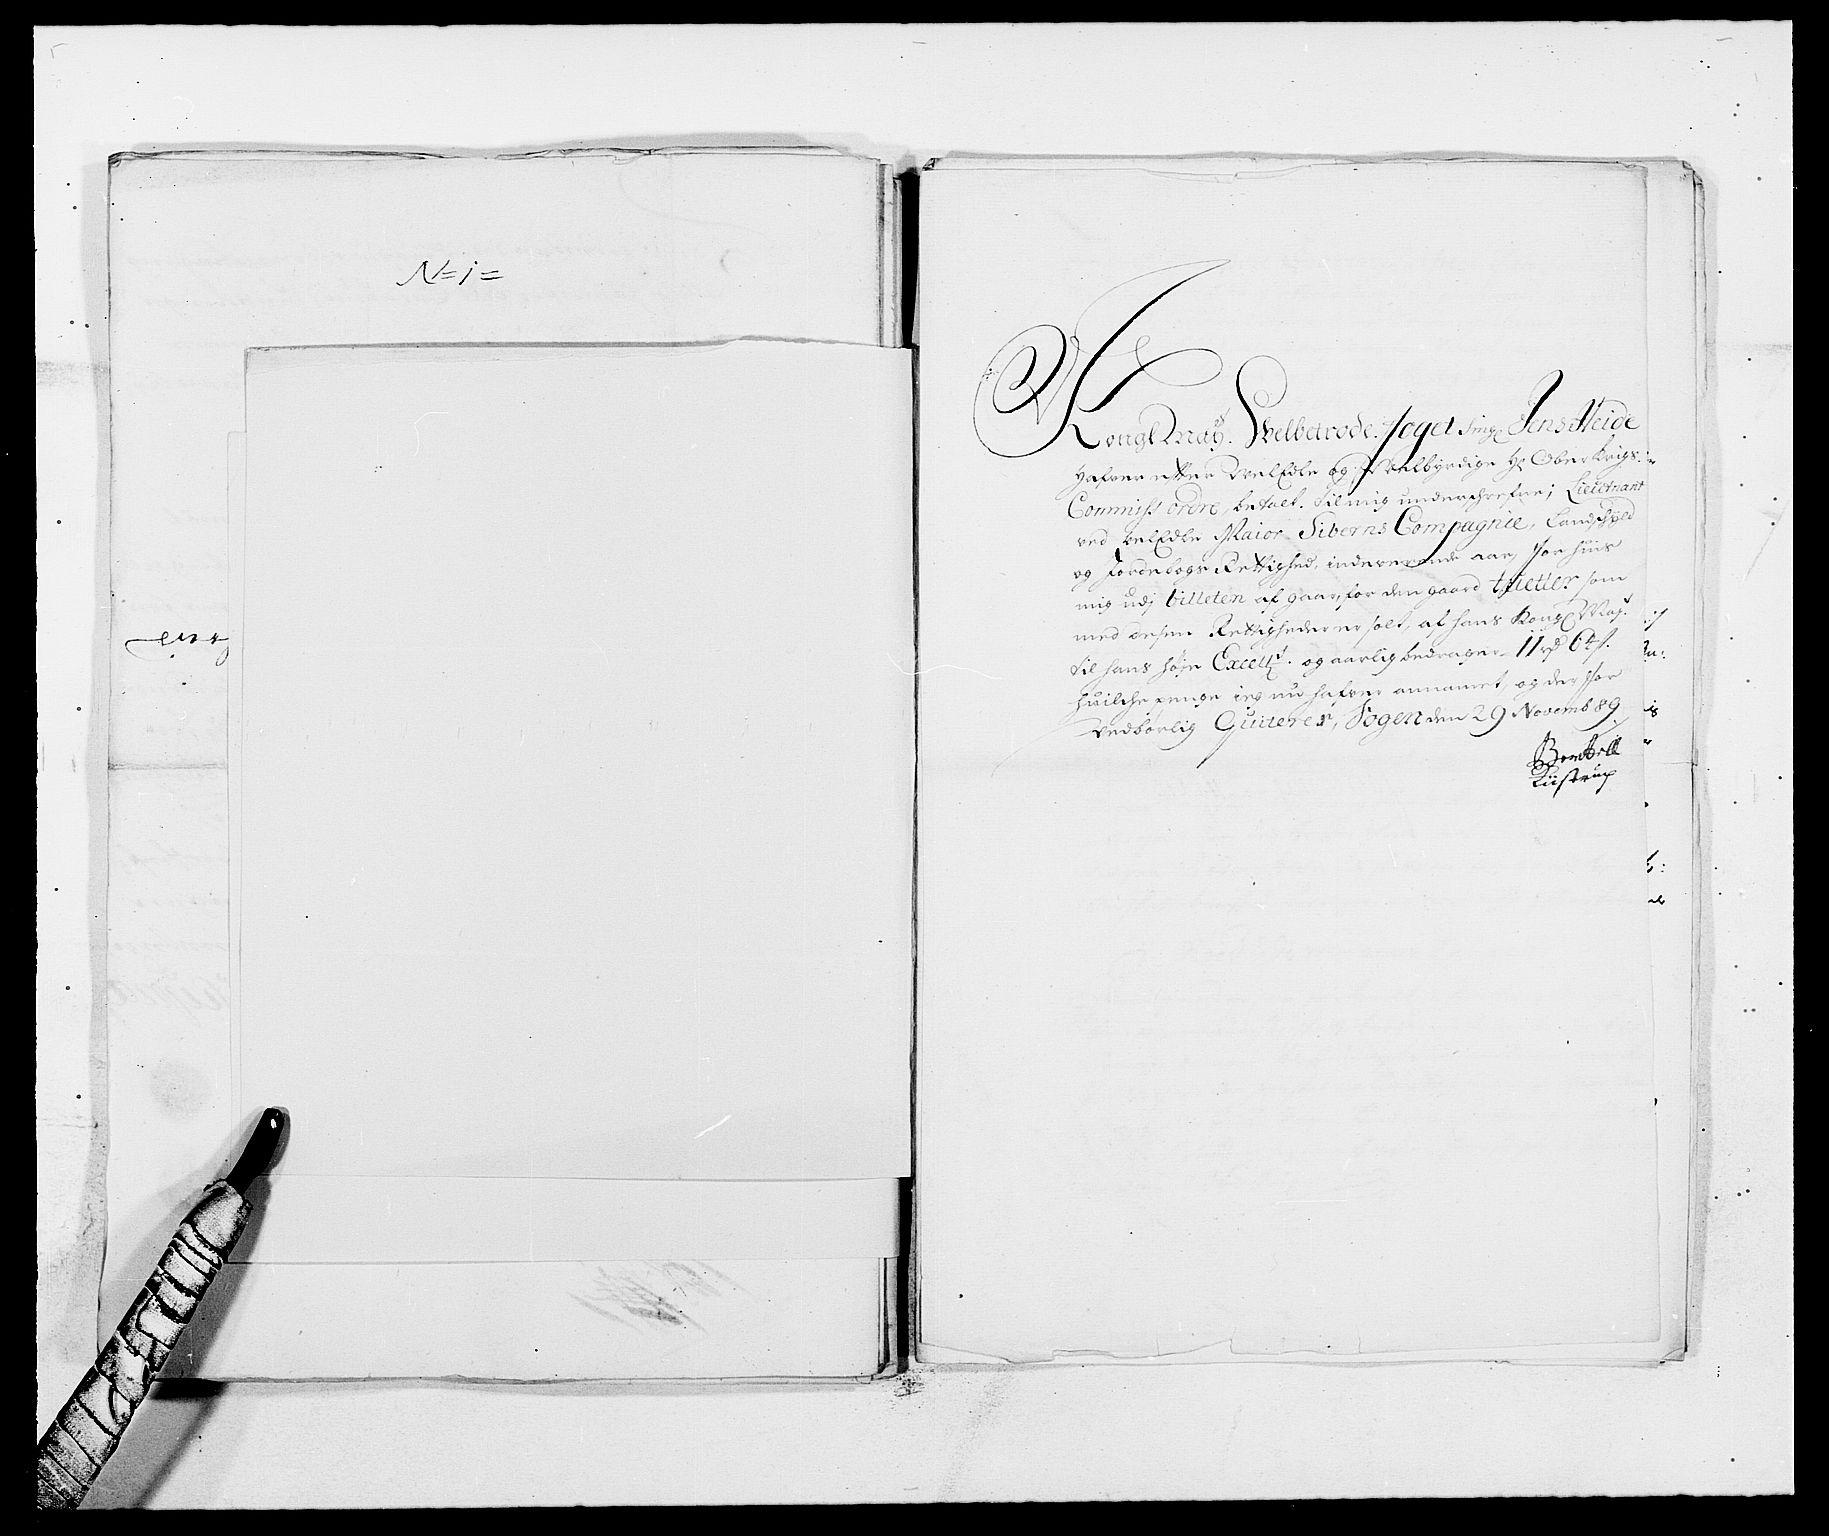 RA, Rentekammeret inntil 1814, Reviderte regnskaper, Fogderegnskap, R09/L0436: Fogderegnskap Follo, 1685-1691, s. 171